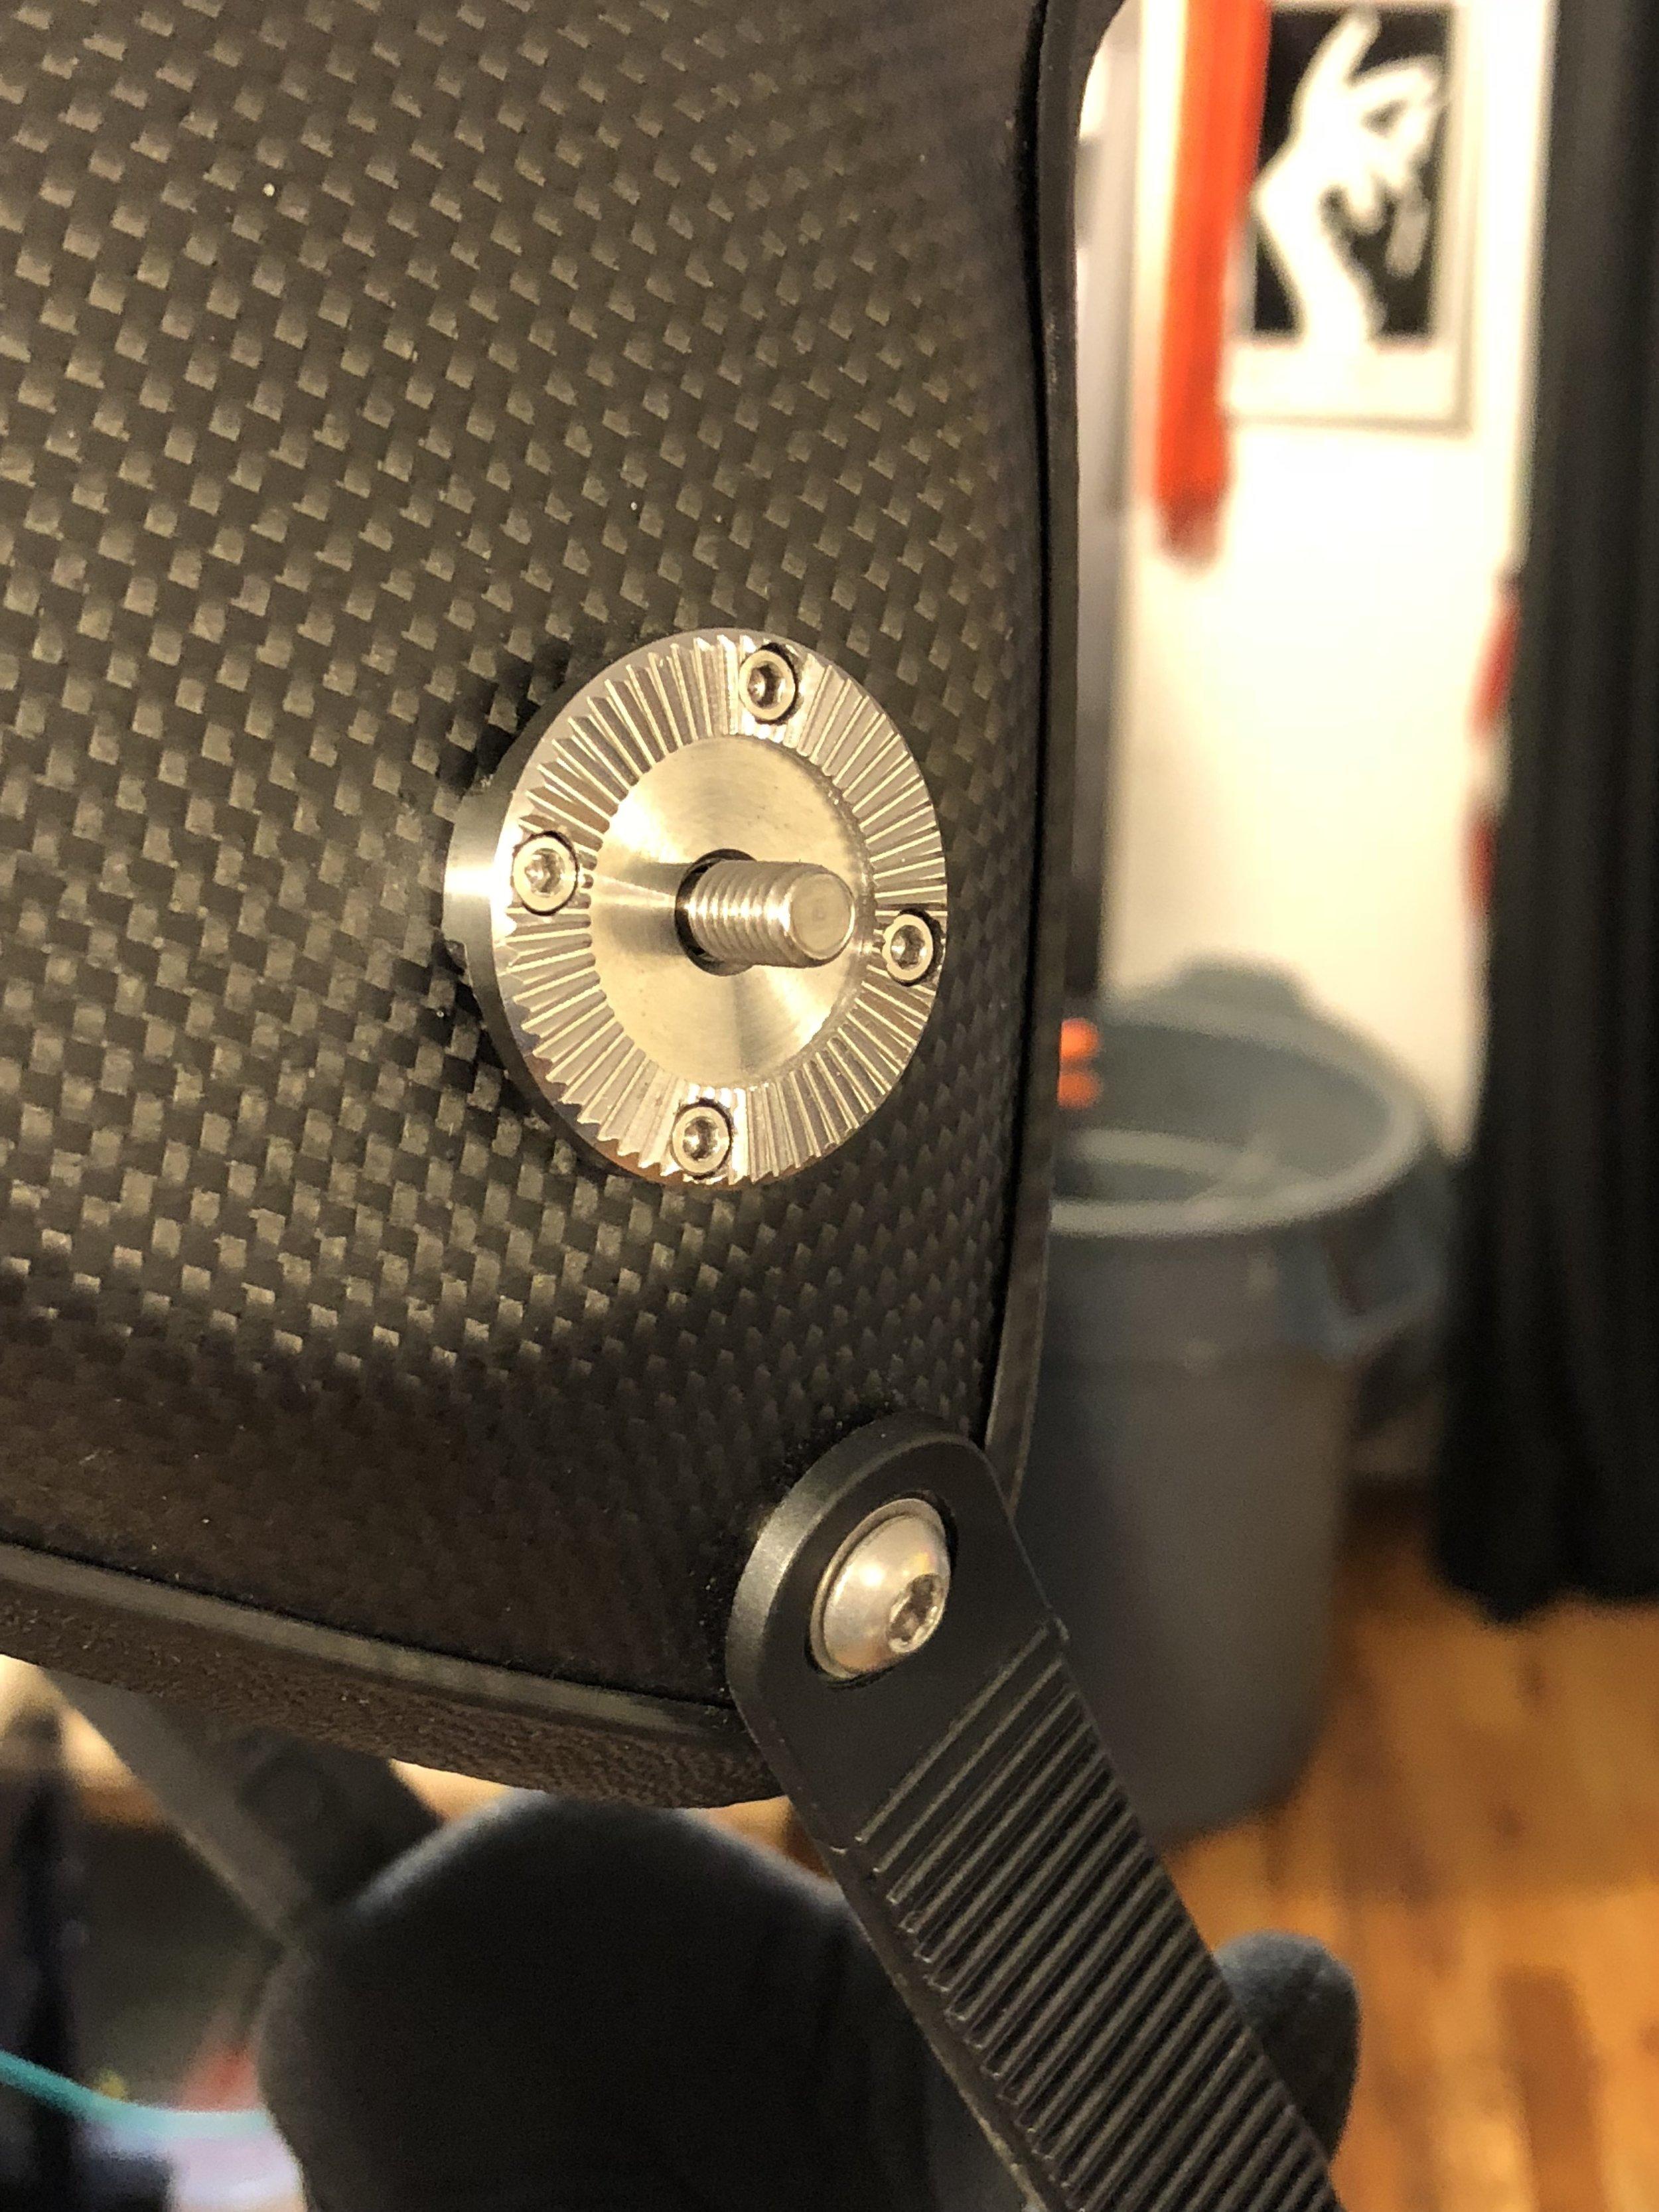 M6 captive screws for lower rosettes